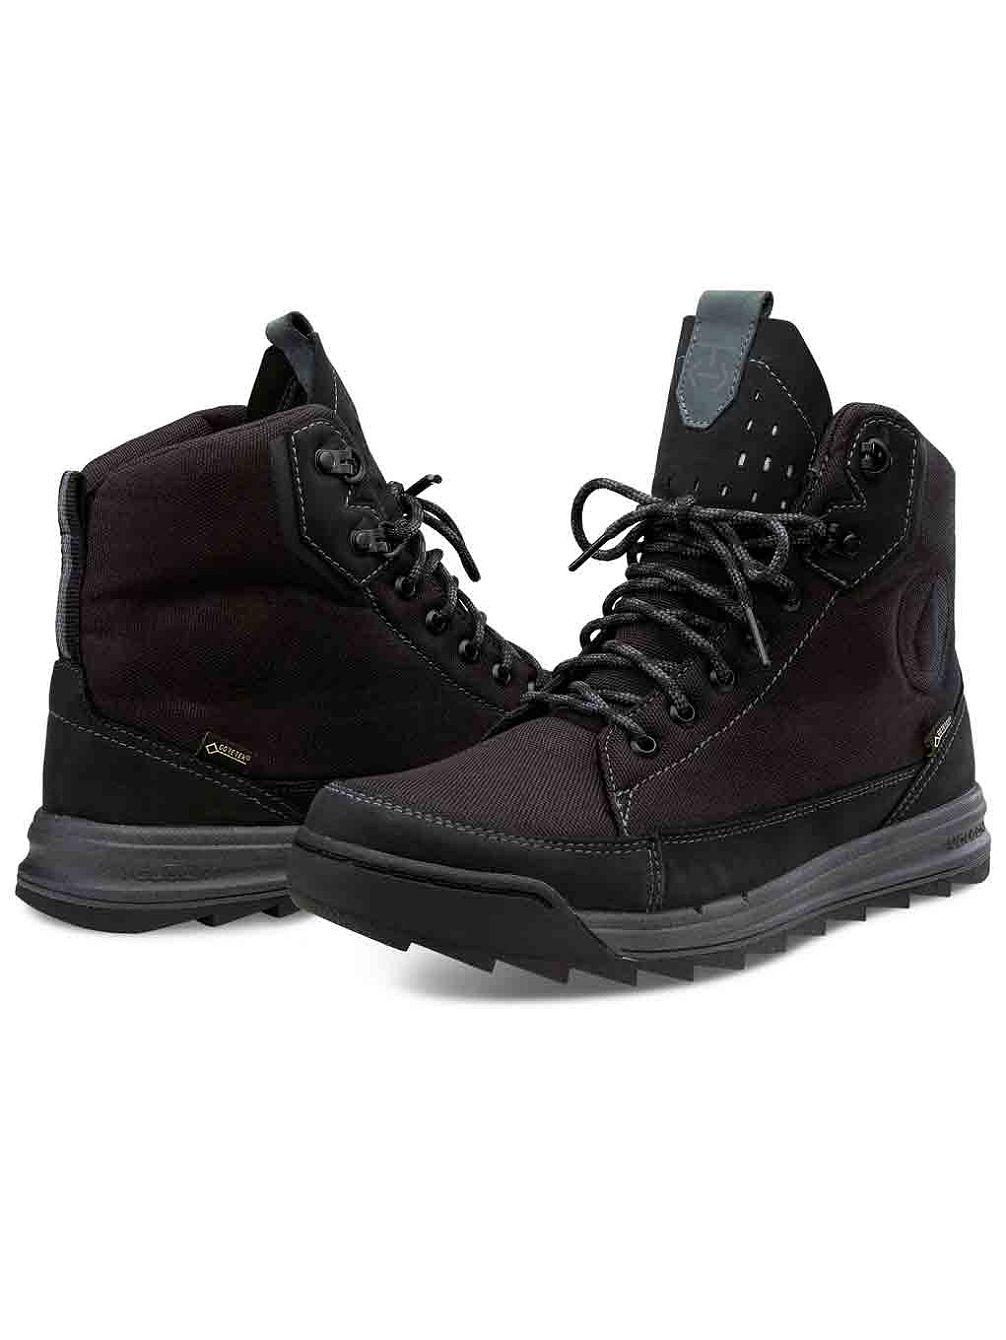 611227de180400 Buy Volcom Roughington Gore-Tex Shoes online at Blue Tomato